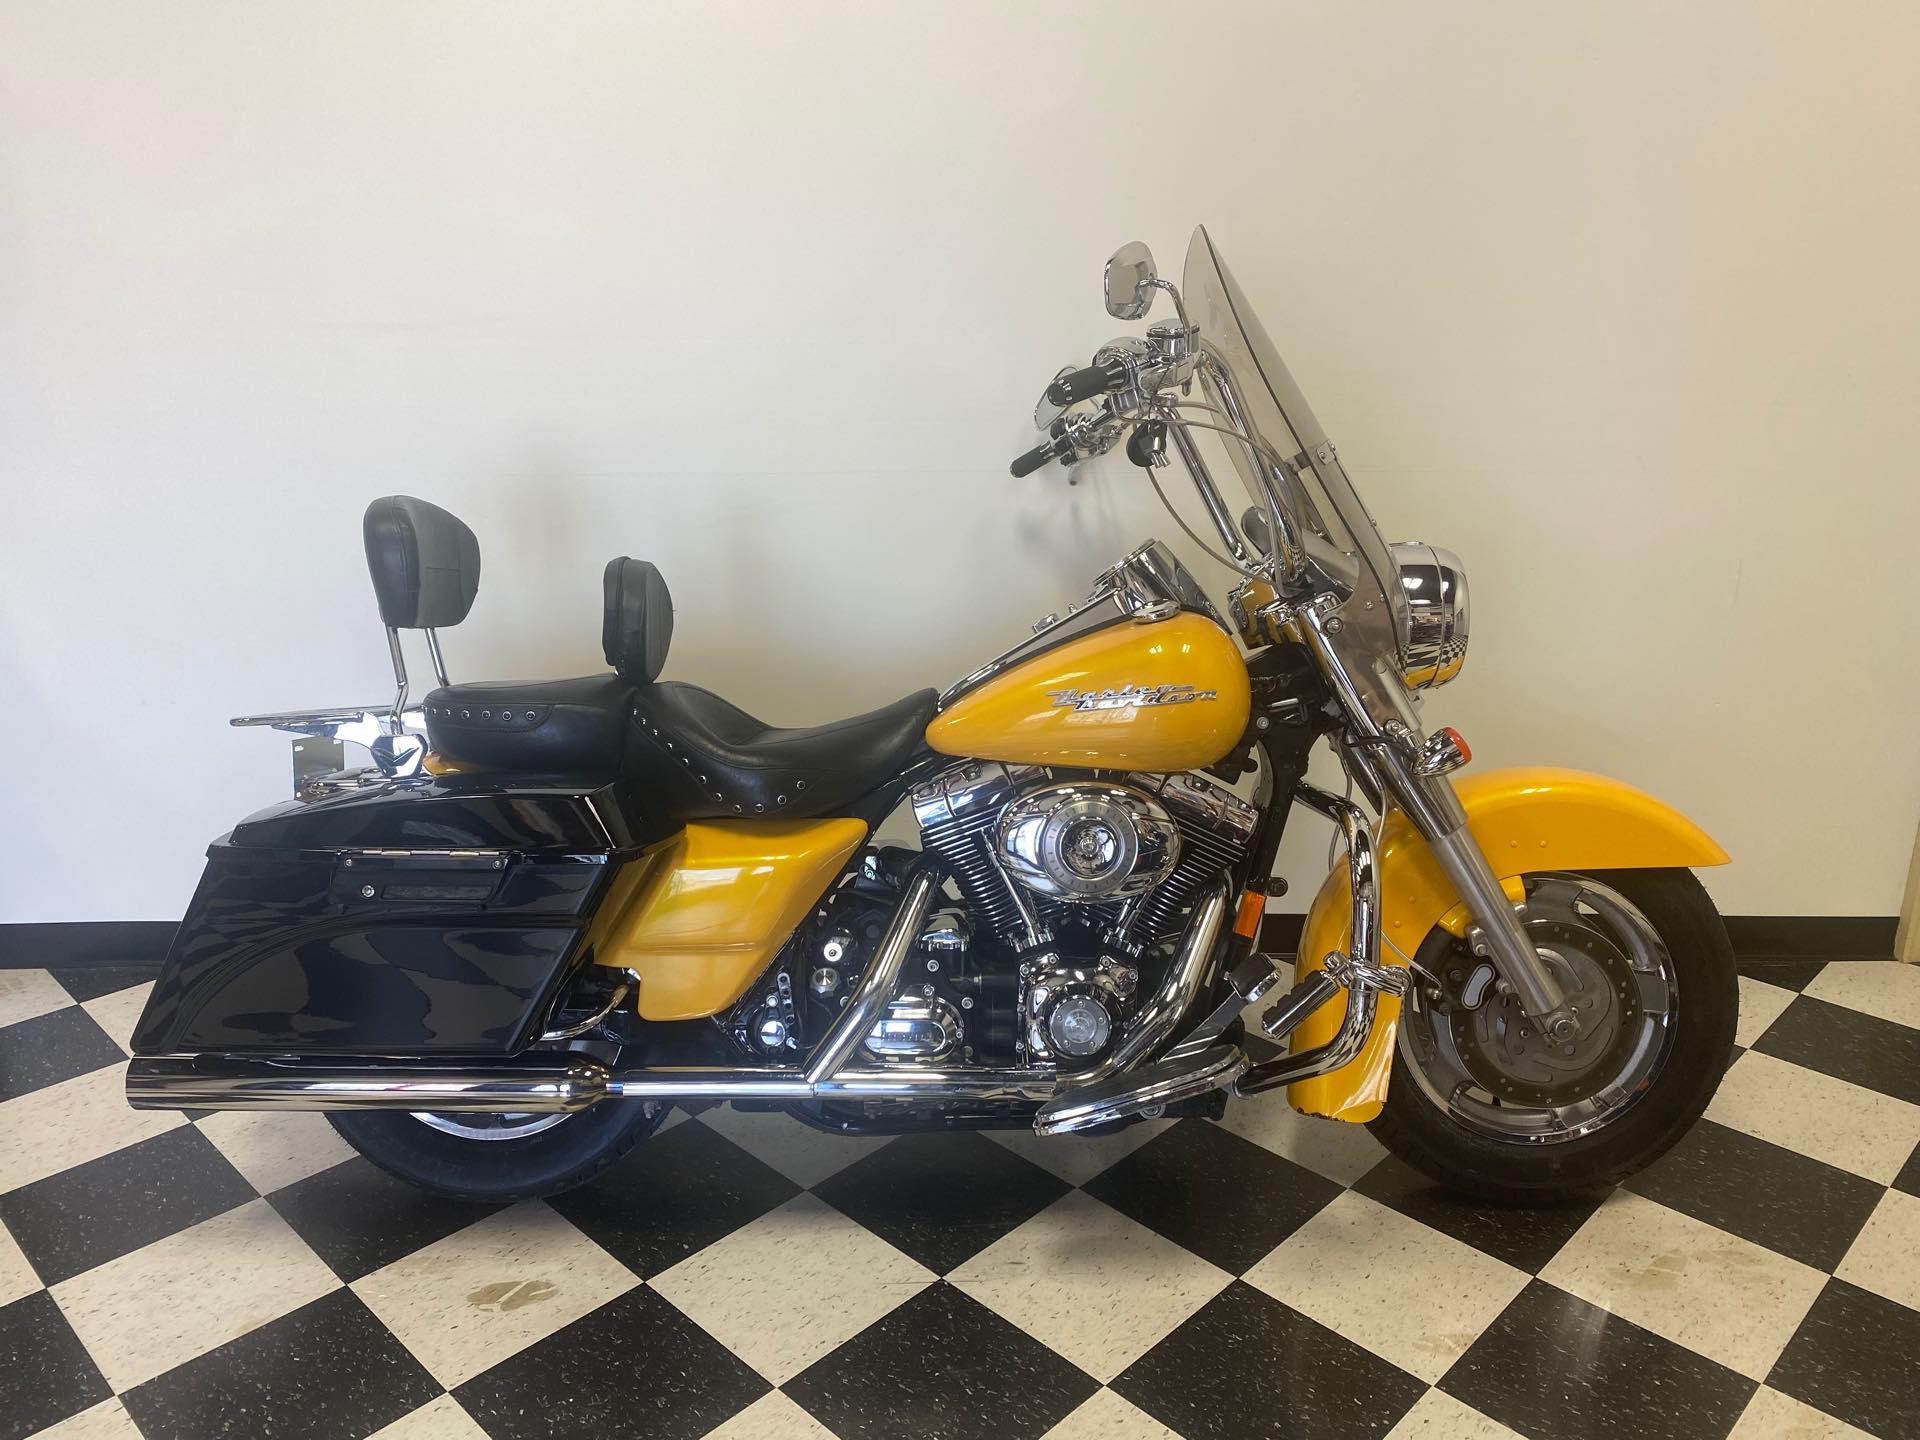 2007 Harley-Davidson Road King Custom at Deluxe Harley Davidson